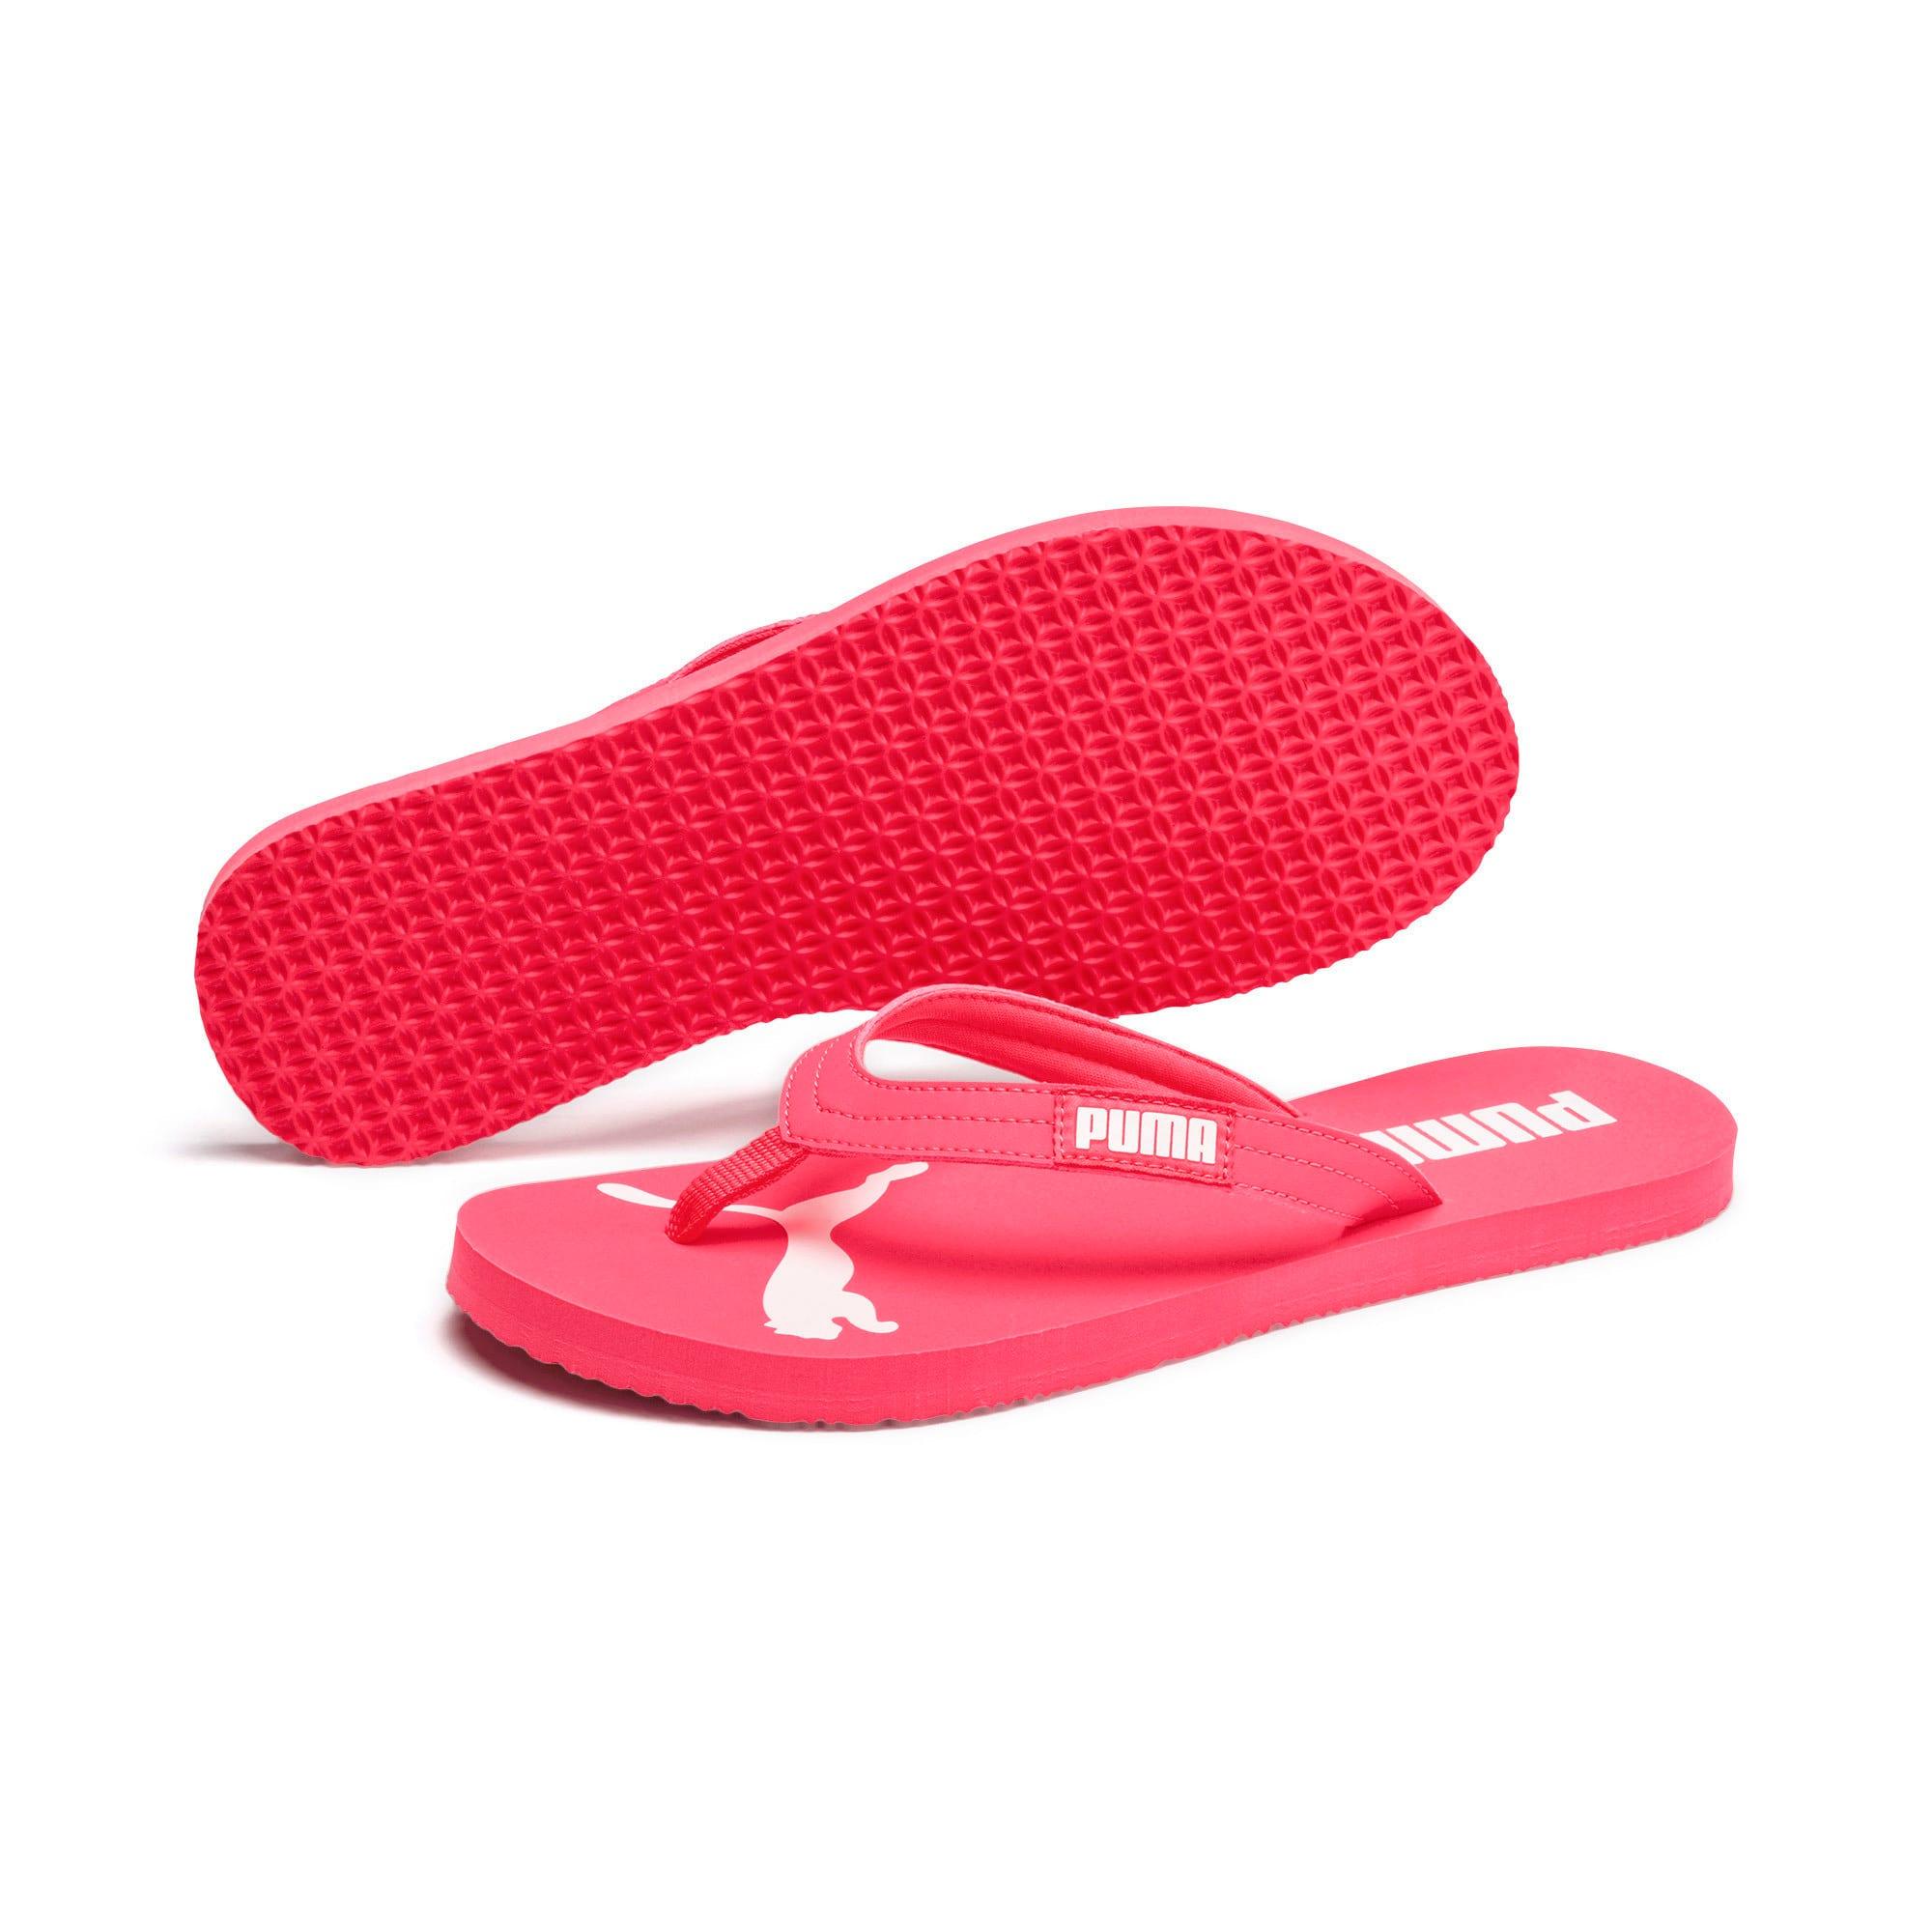 Thumbnail 2 of Cosy Flip Women's Sandals, Pink Alert-Puma White, medium